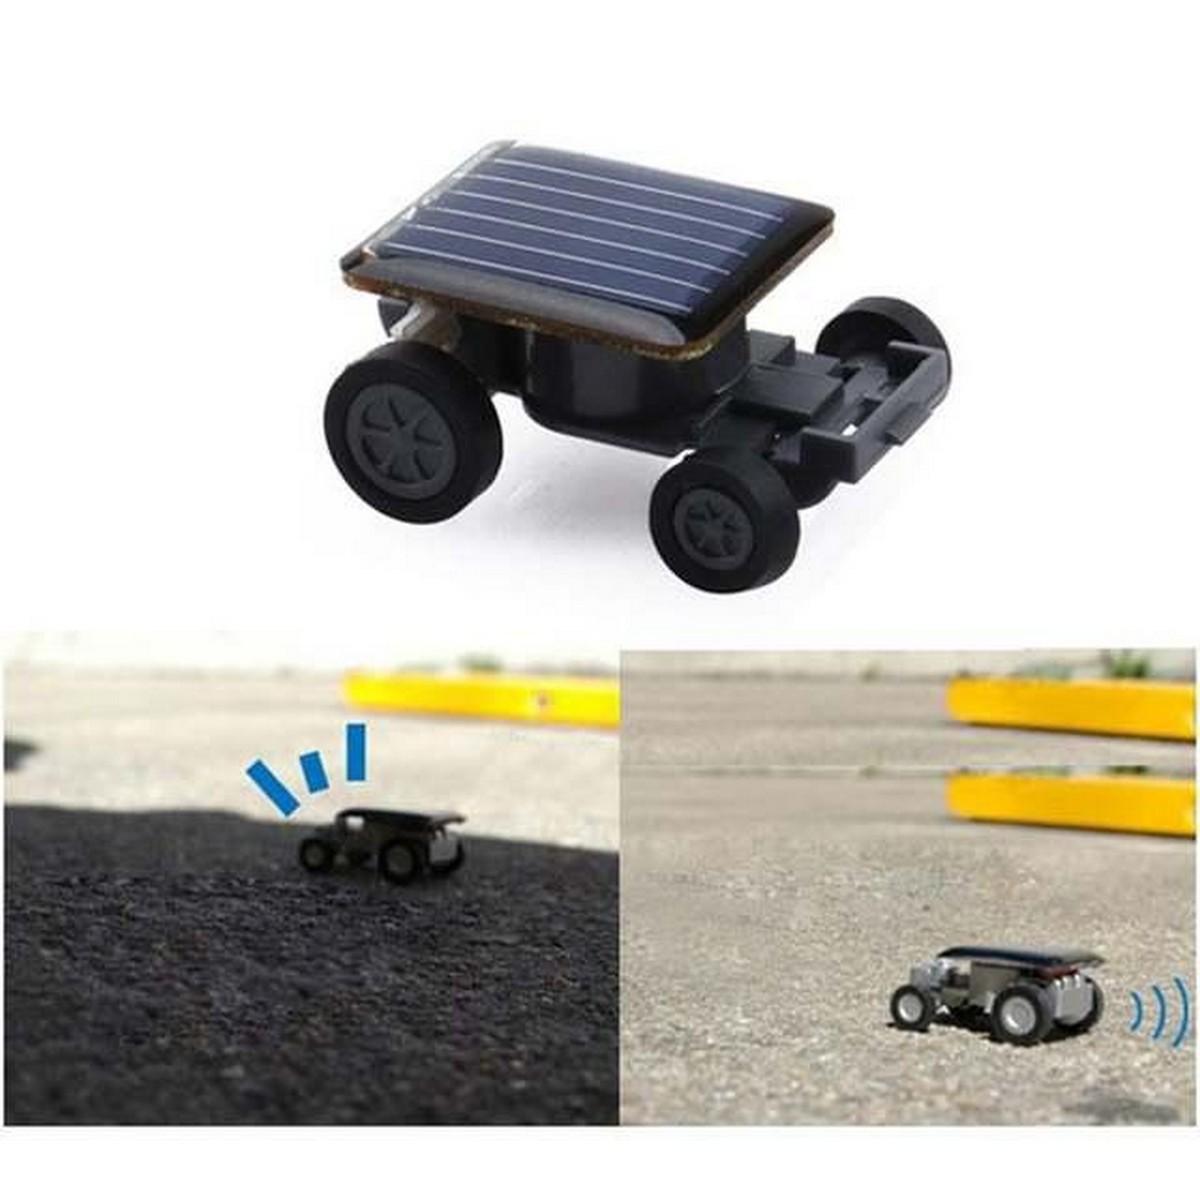 Creative Mini Solar Powered Car Model Sunlight Toys Kit Gadgets Educational Baby Kids Toys for Children